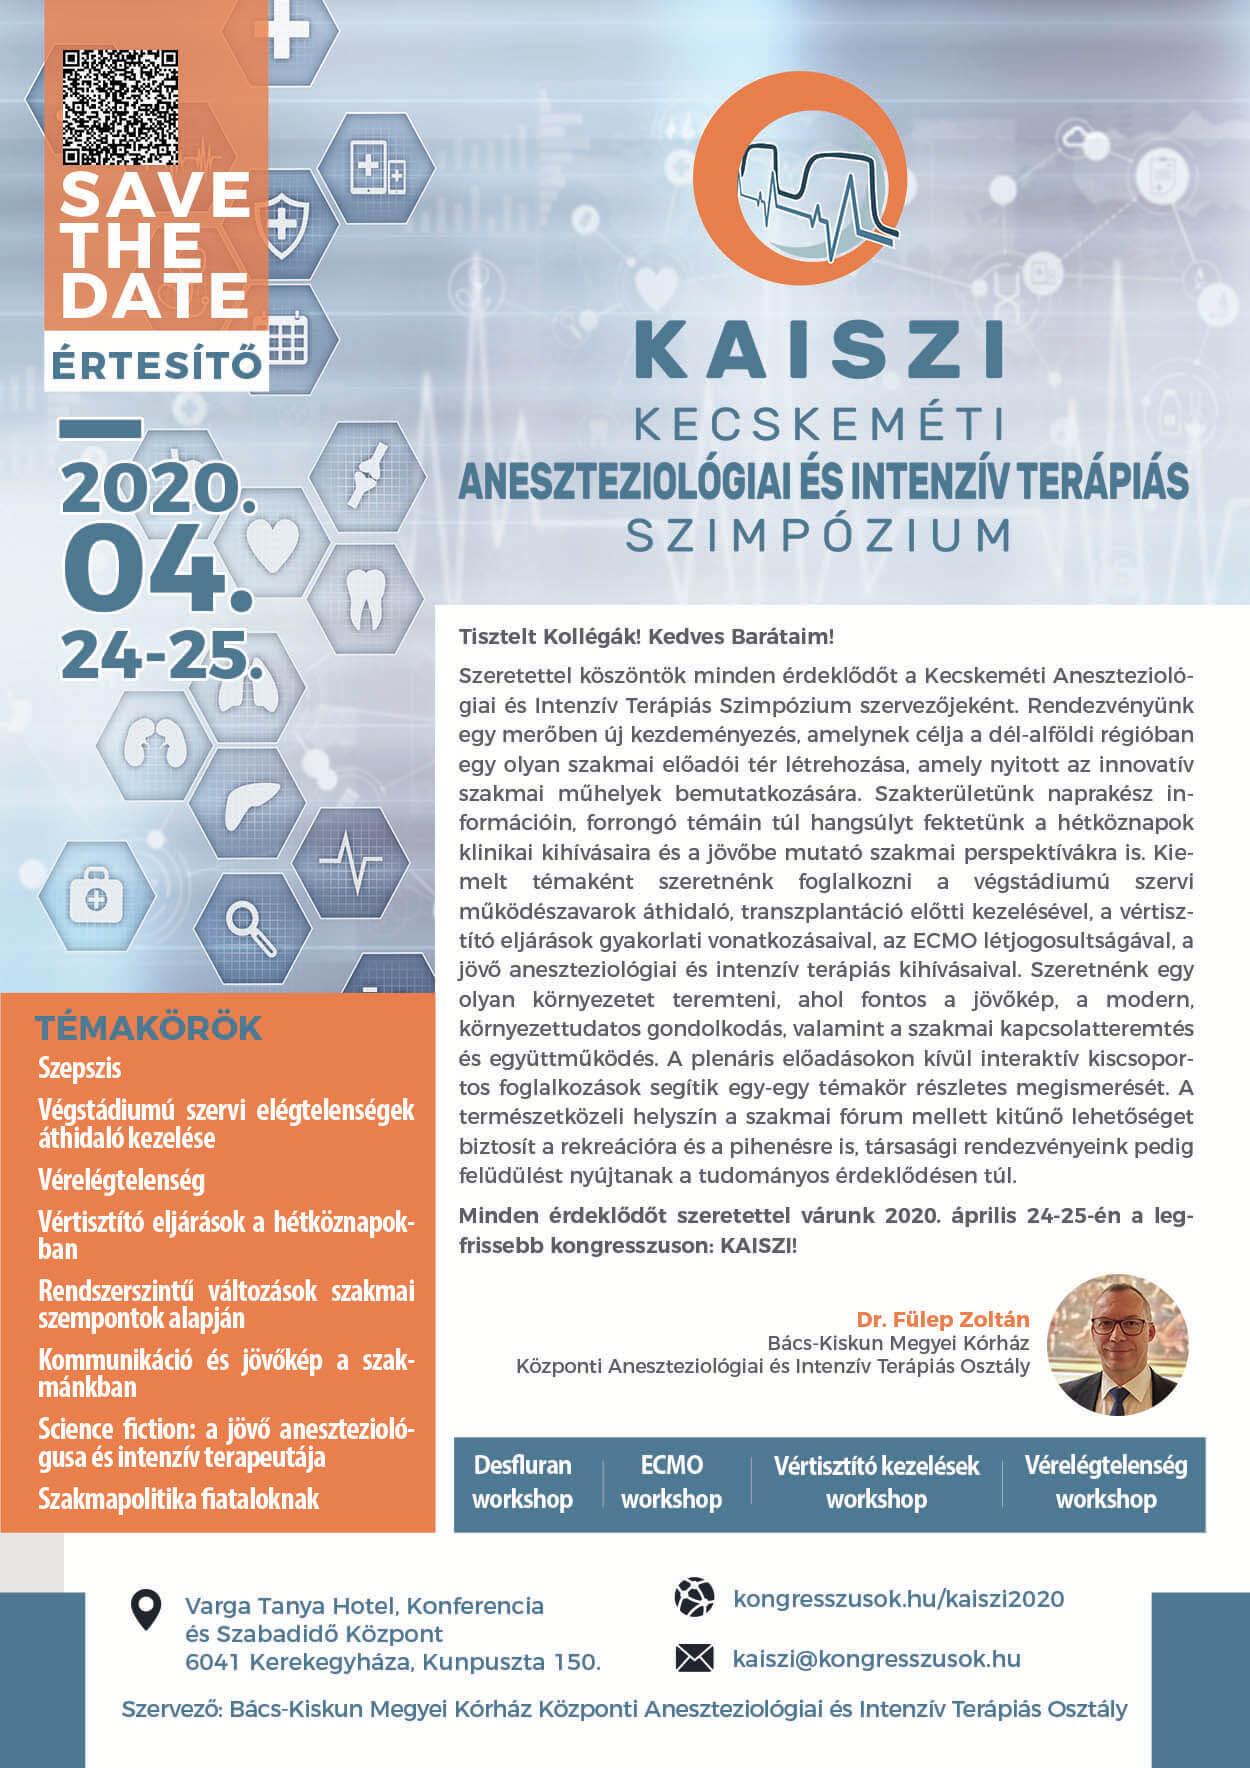 ertesito_kaiszi_2020_web_2